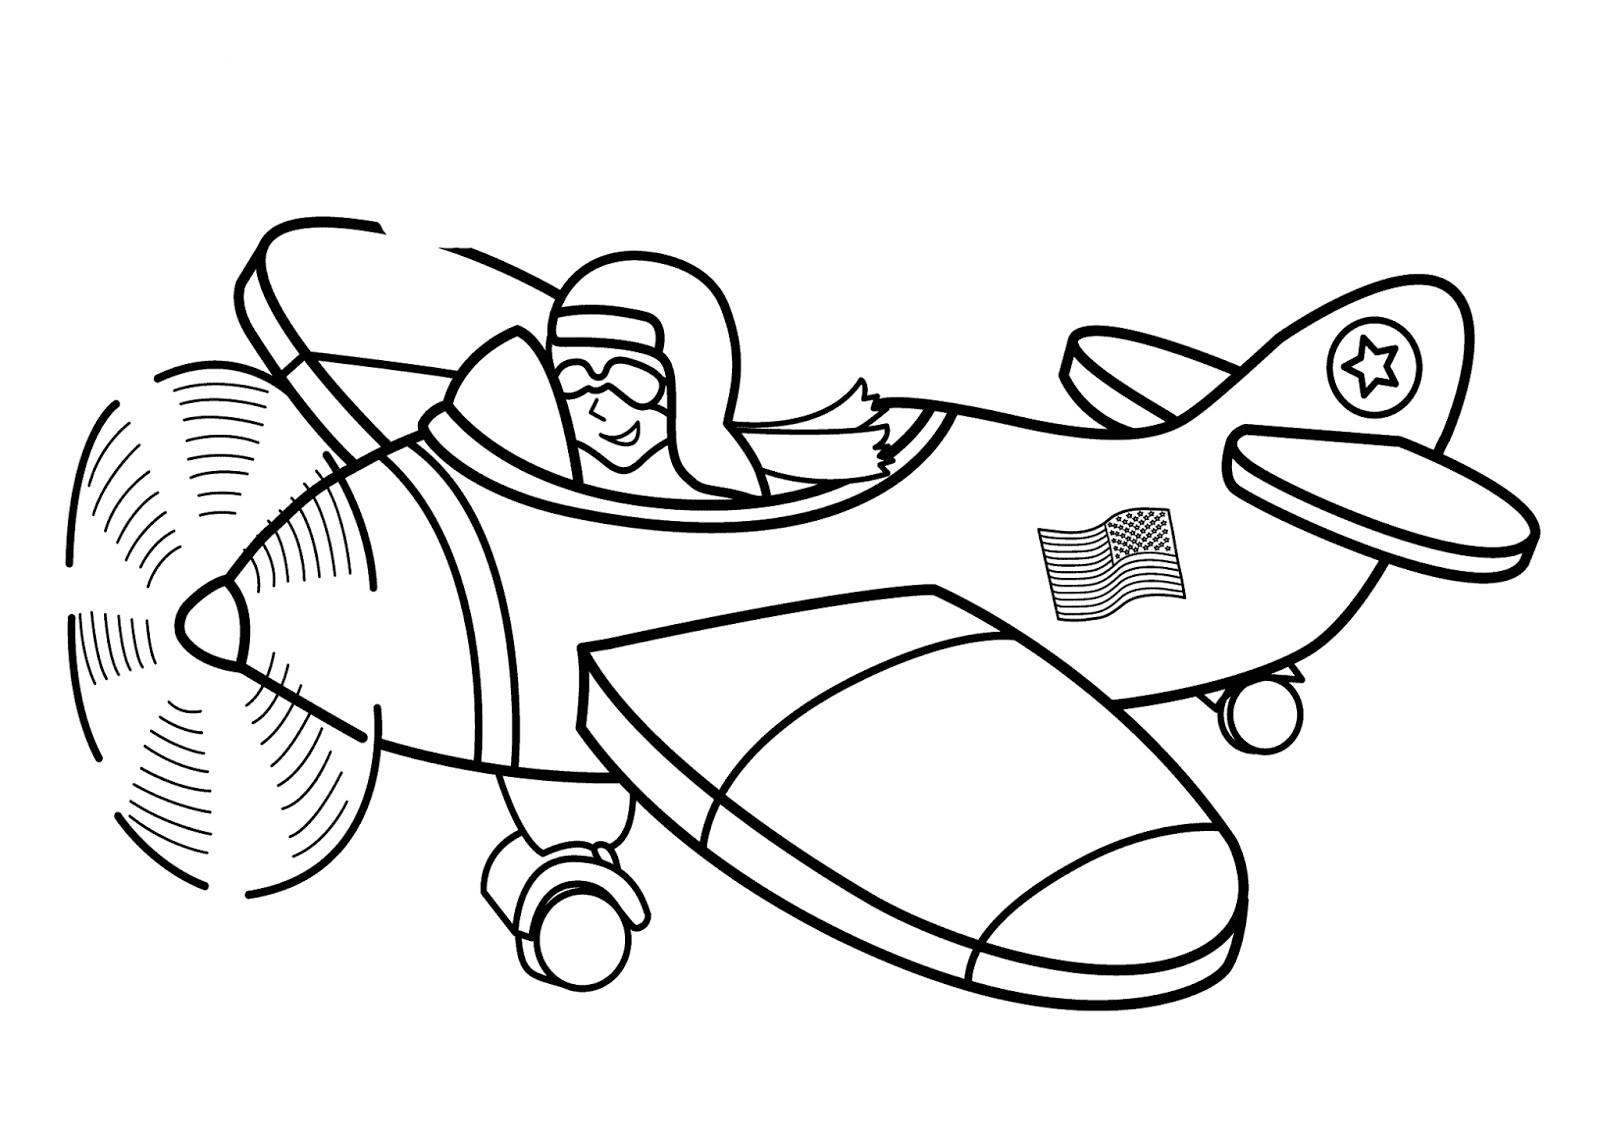 Pilot Coloring Pages For Kids  Transportation For Kids Coloring Pages